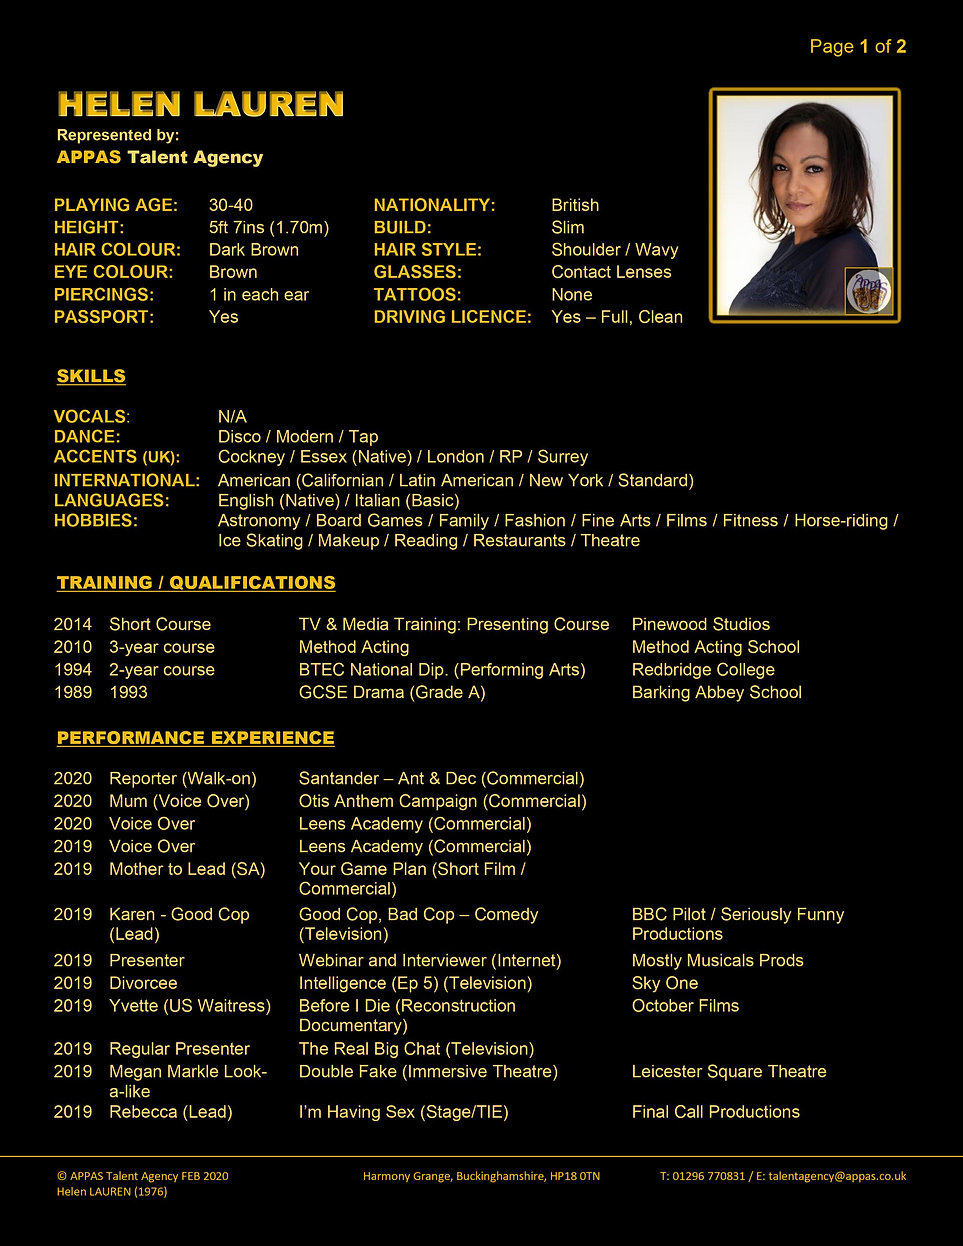 HELEN LAUREN WEB CV (FEB 2020) 1.jpg